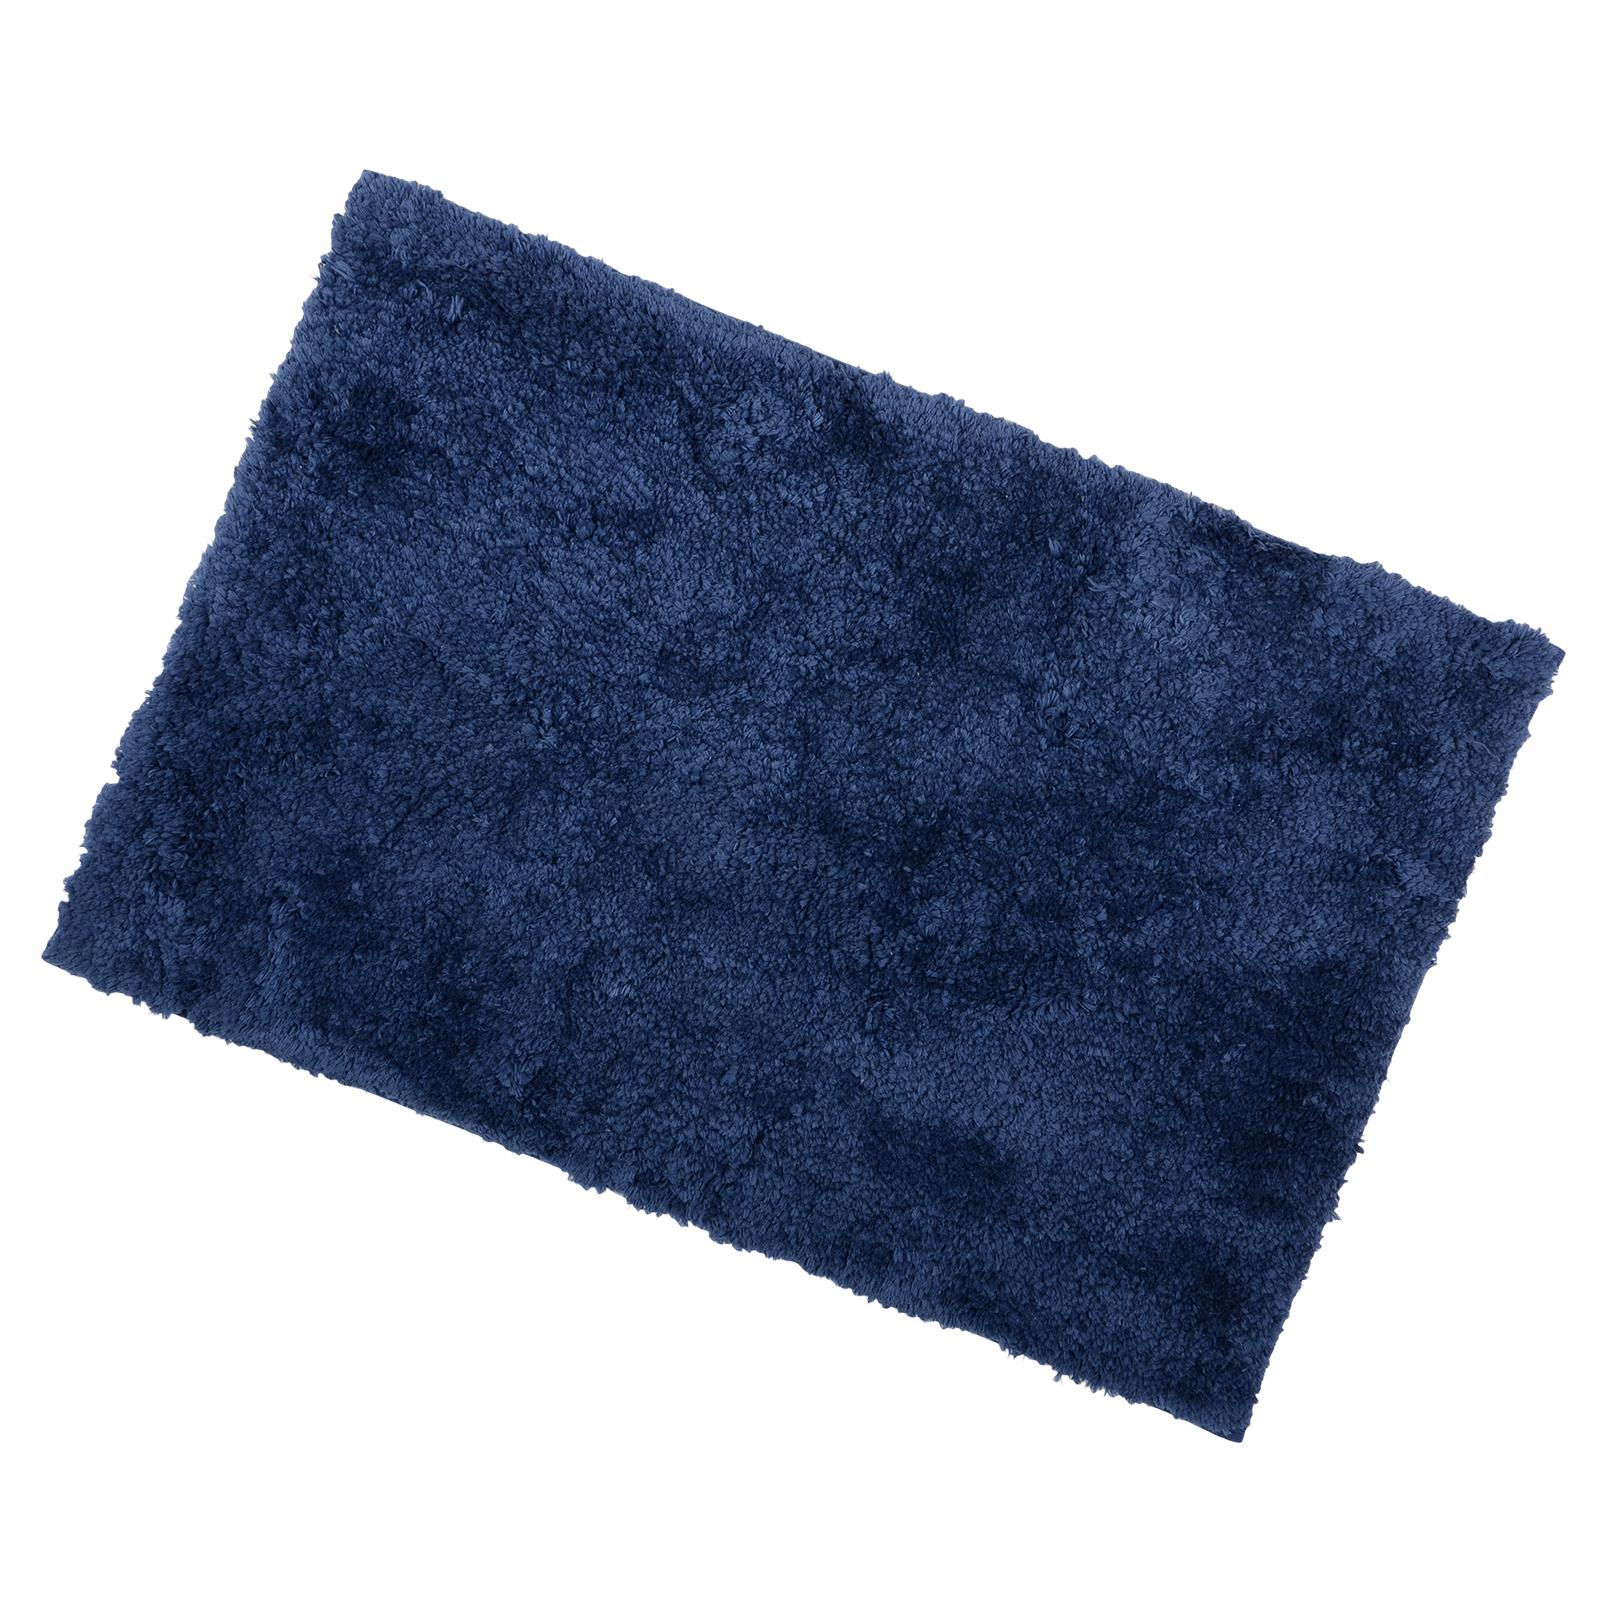 Soft Tufted Microfibre Bathroom Shower Bath Mat Rug Non Slip Back 12 Colours Ebay